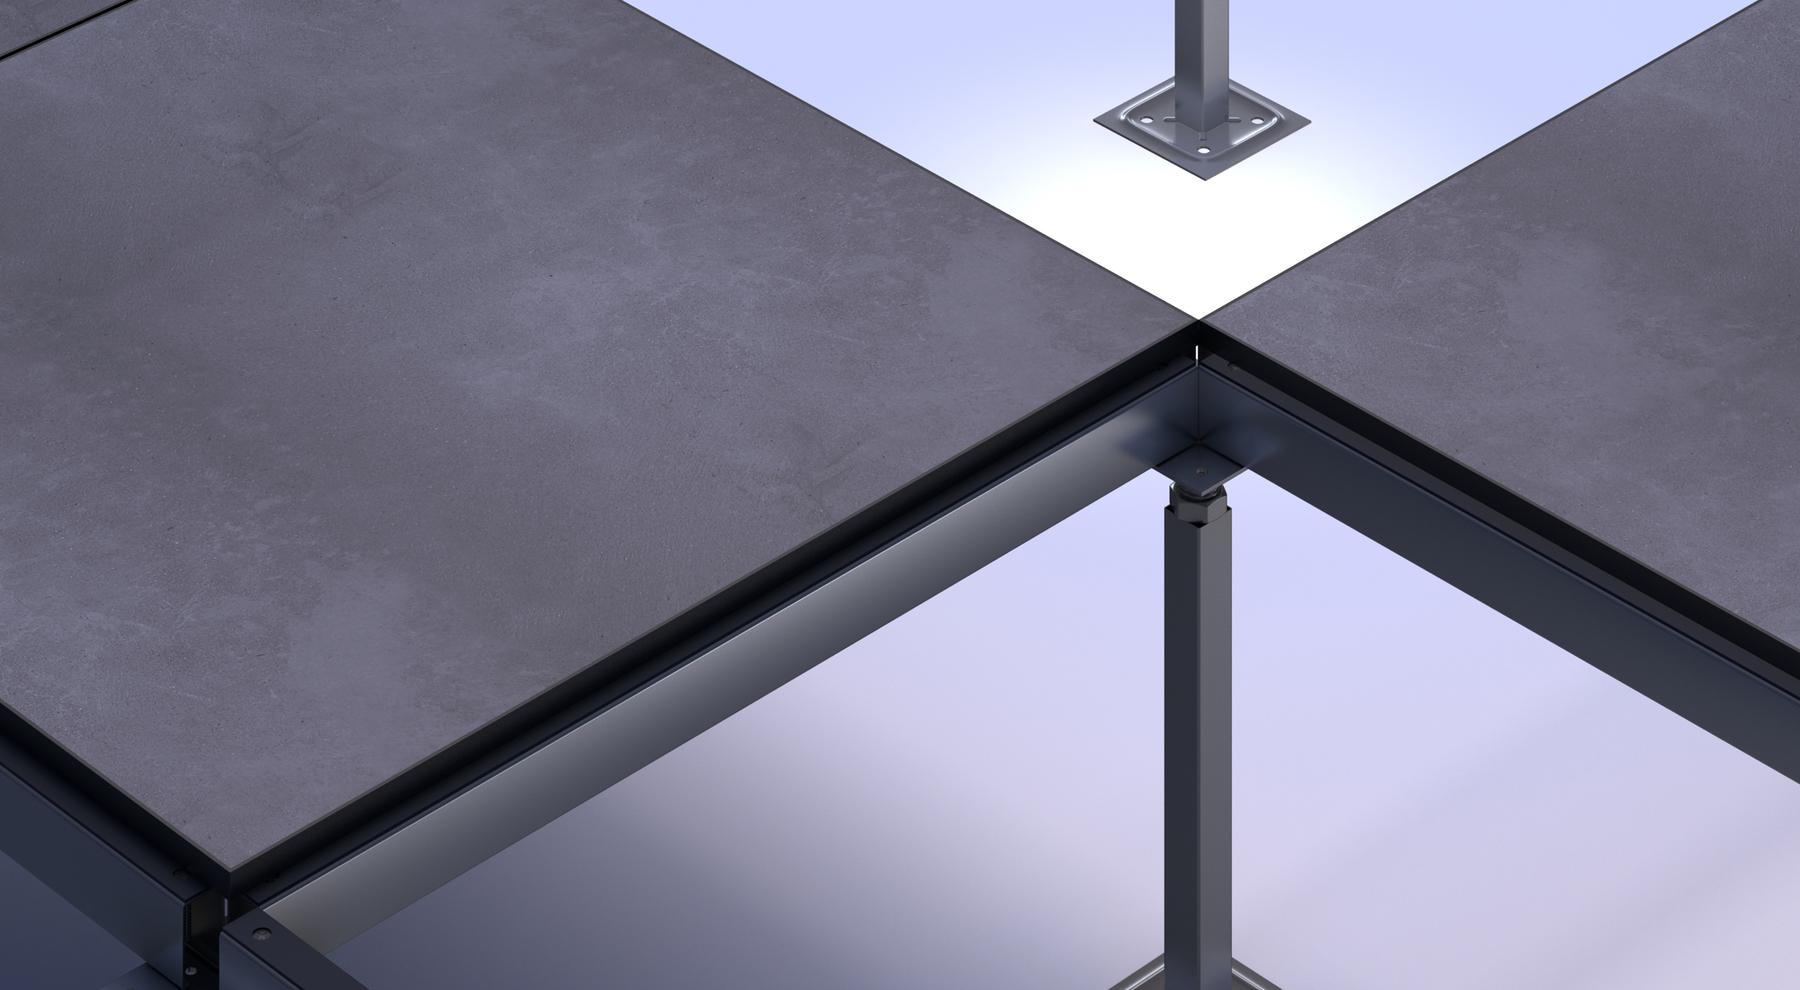 Tate 2/'x2/' Concrete Filled Raised Access HPL Gray Starlight Floor Tiles